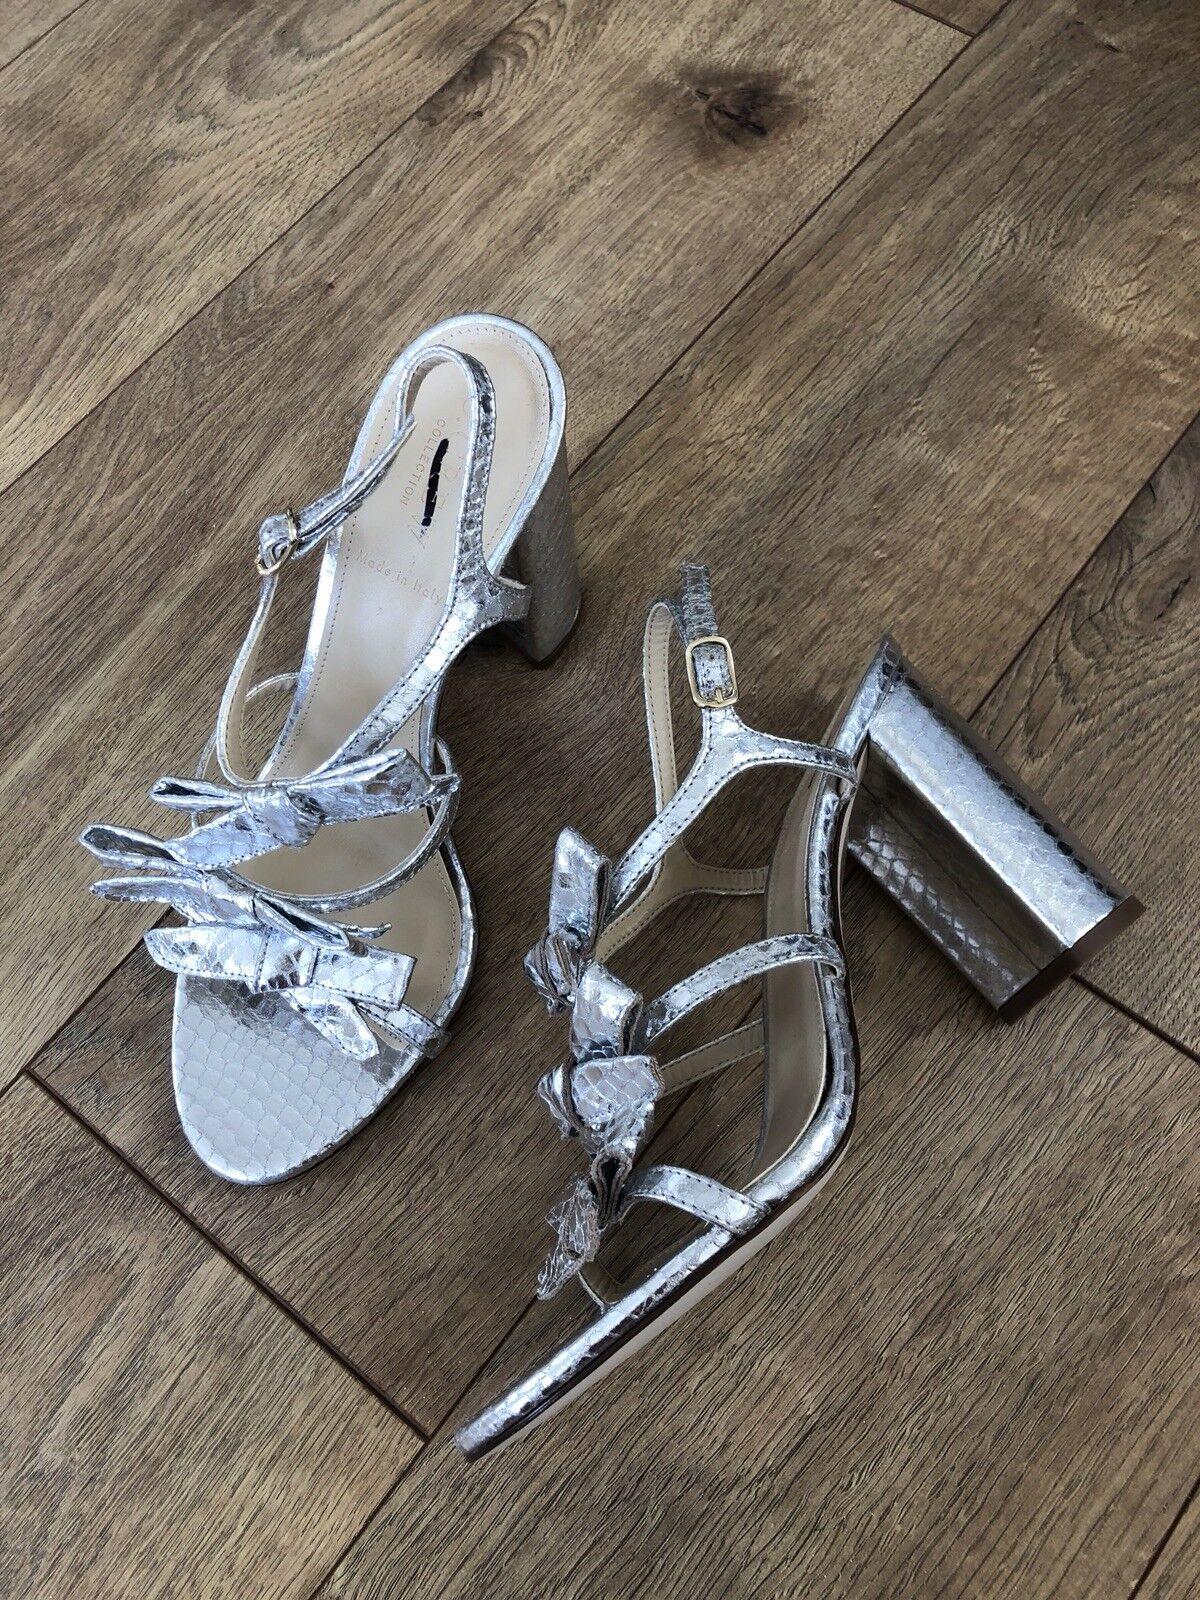 New JCrew Collection  218 Stella Bow Heels (100mm) in Metallic Silber Sz 8 H5569